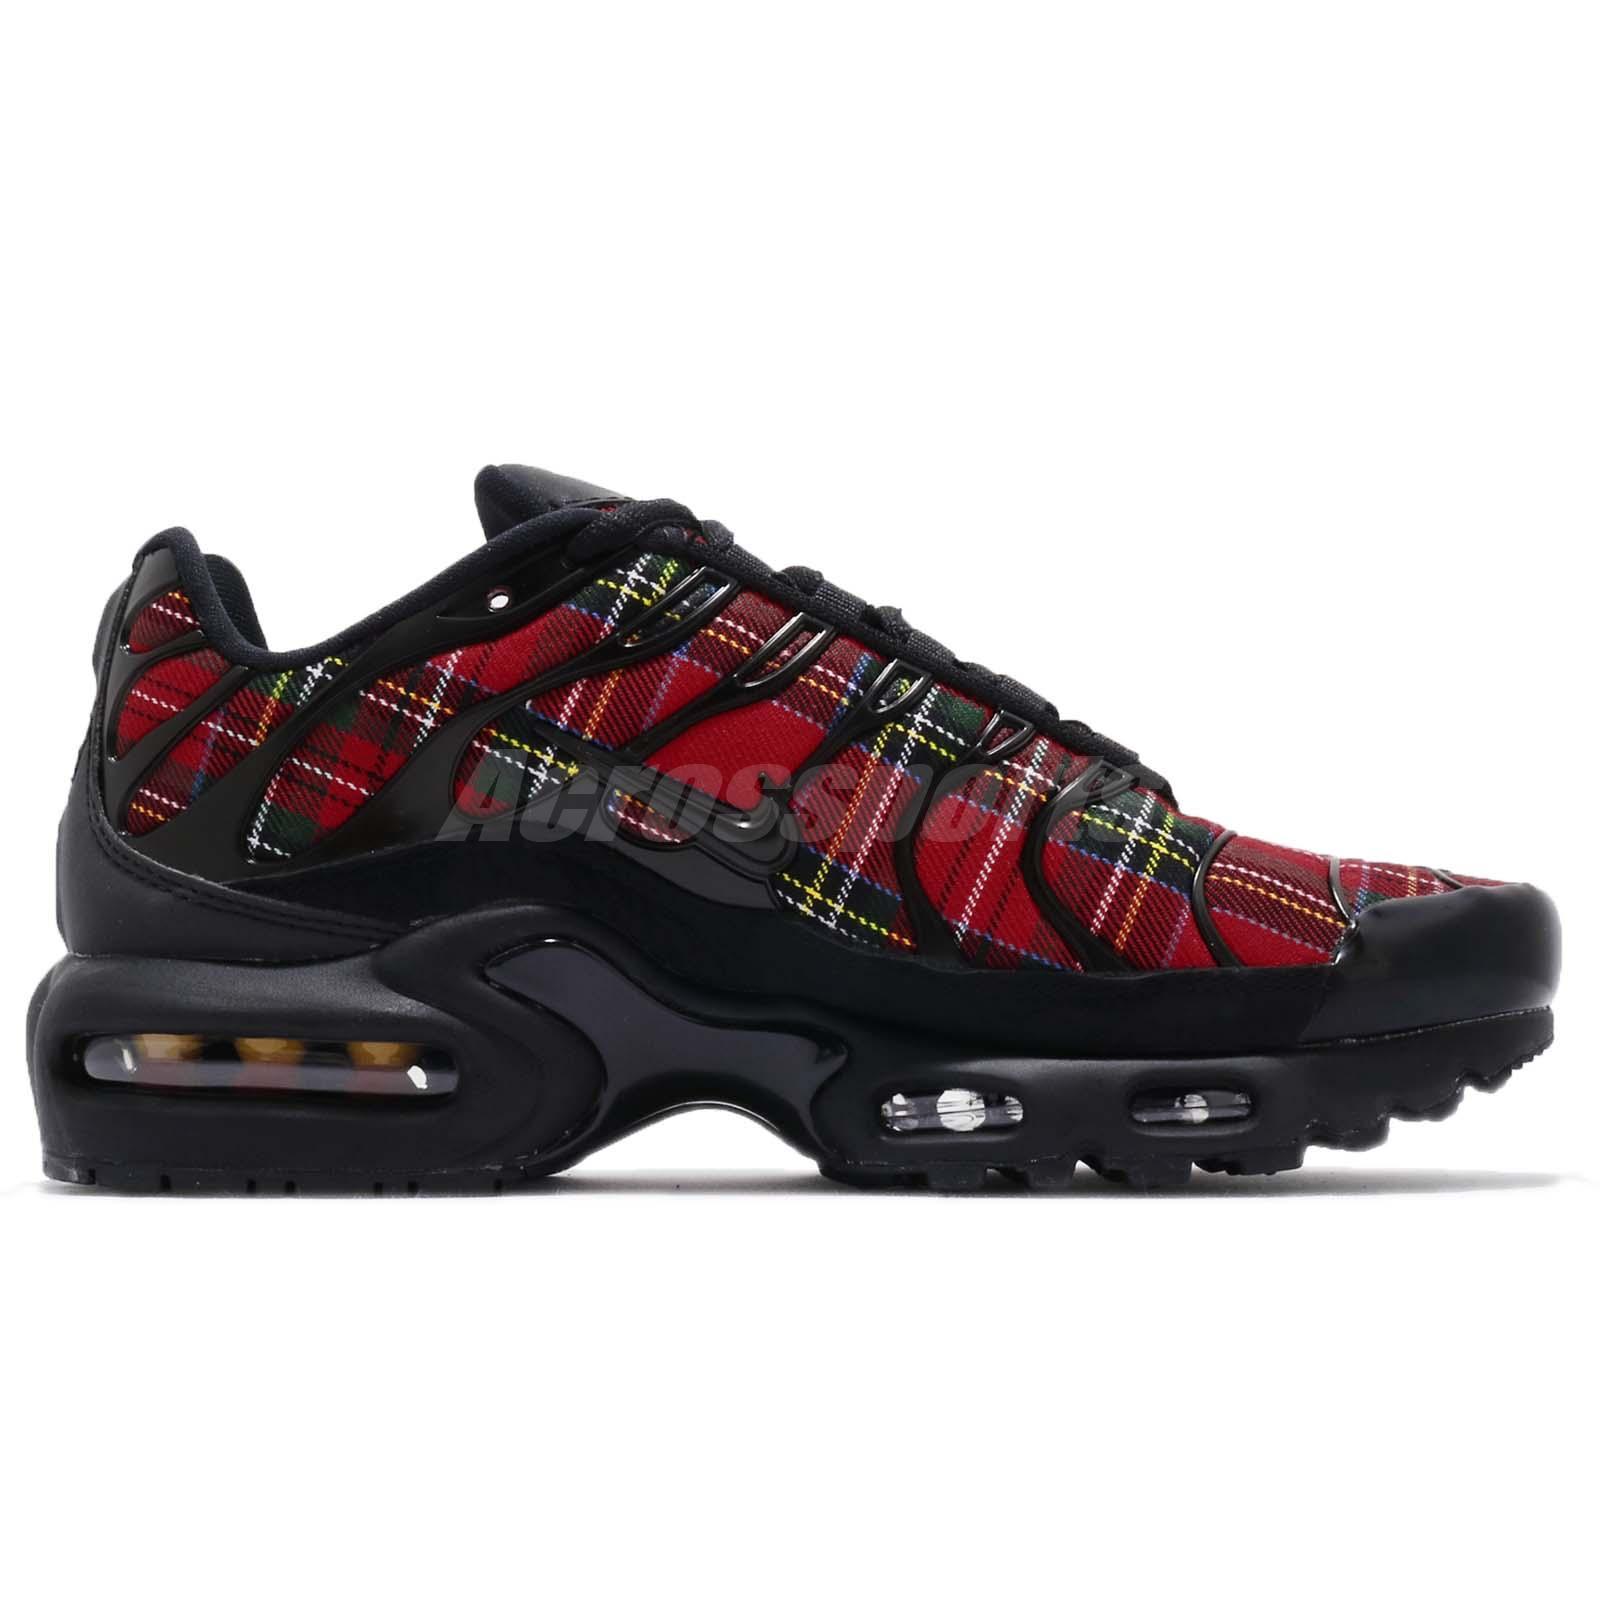 quality design 393fc 26225 Nike Wmns Air Max Plus TN SE Tartan Black Red Womens Running Shoes ...